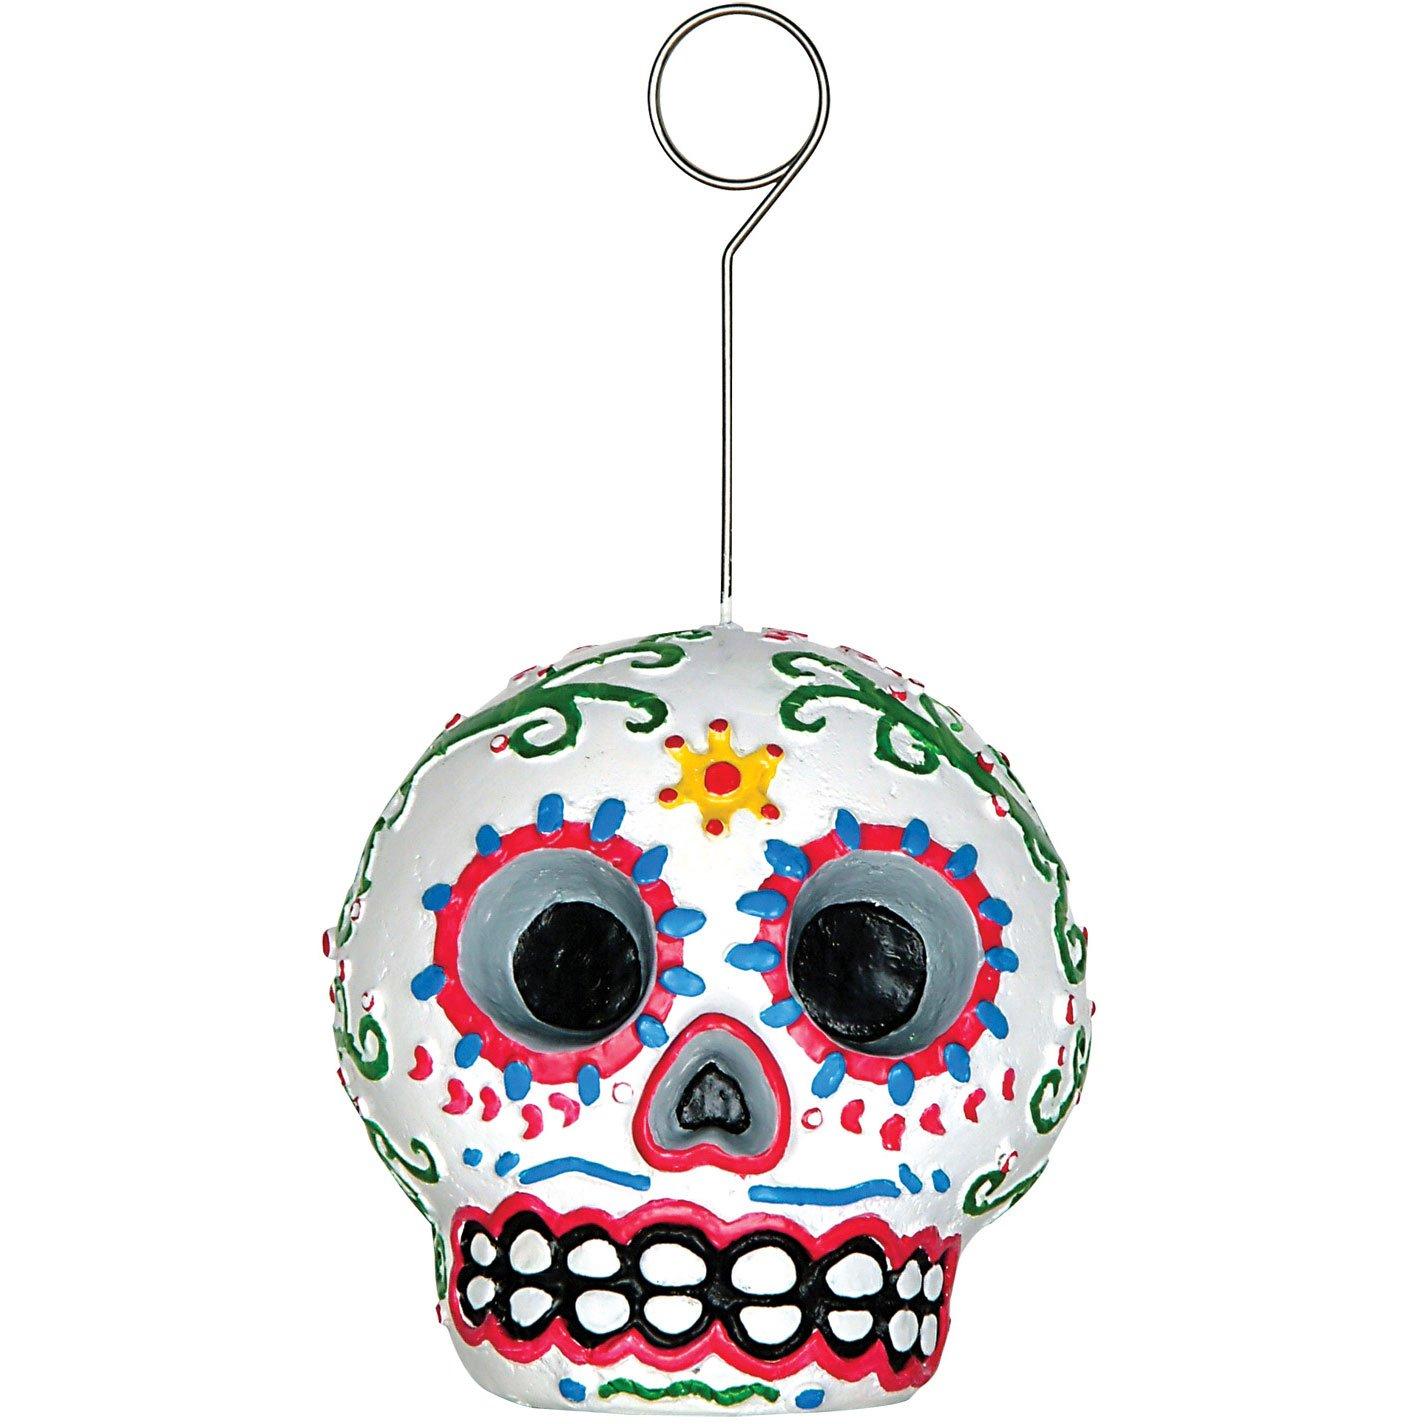 Amazon.com: Day Of The Dead Sugar Skull Photo Holder: Kitchen & Dining